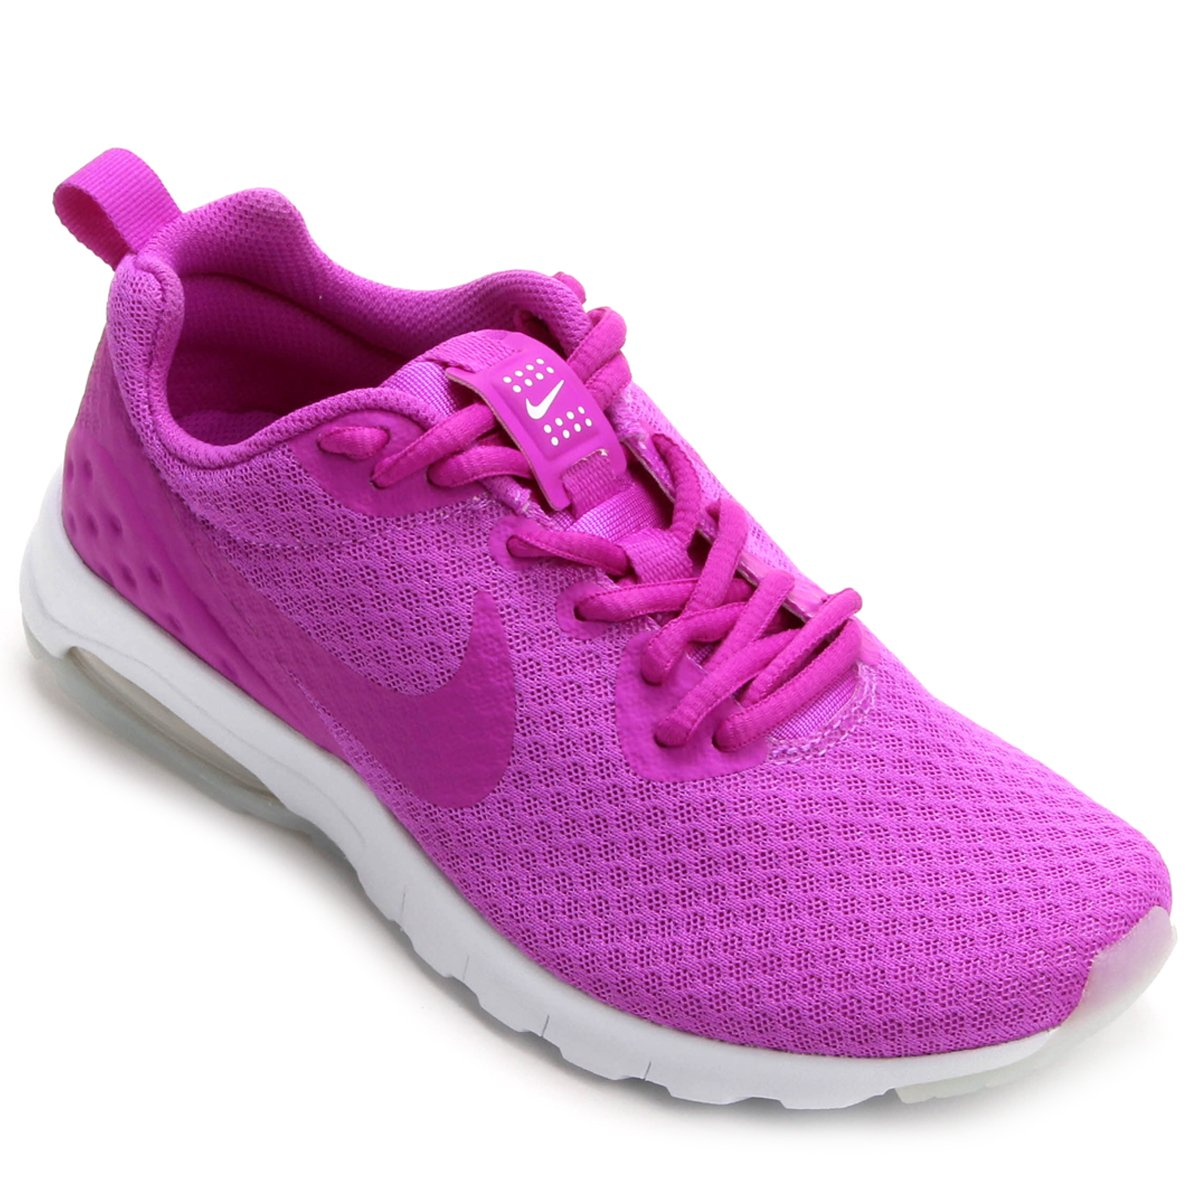 d6bc7e4bed Tênis Nike Air Max Motion Lw Feminino - Compre Agora